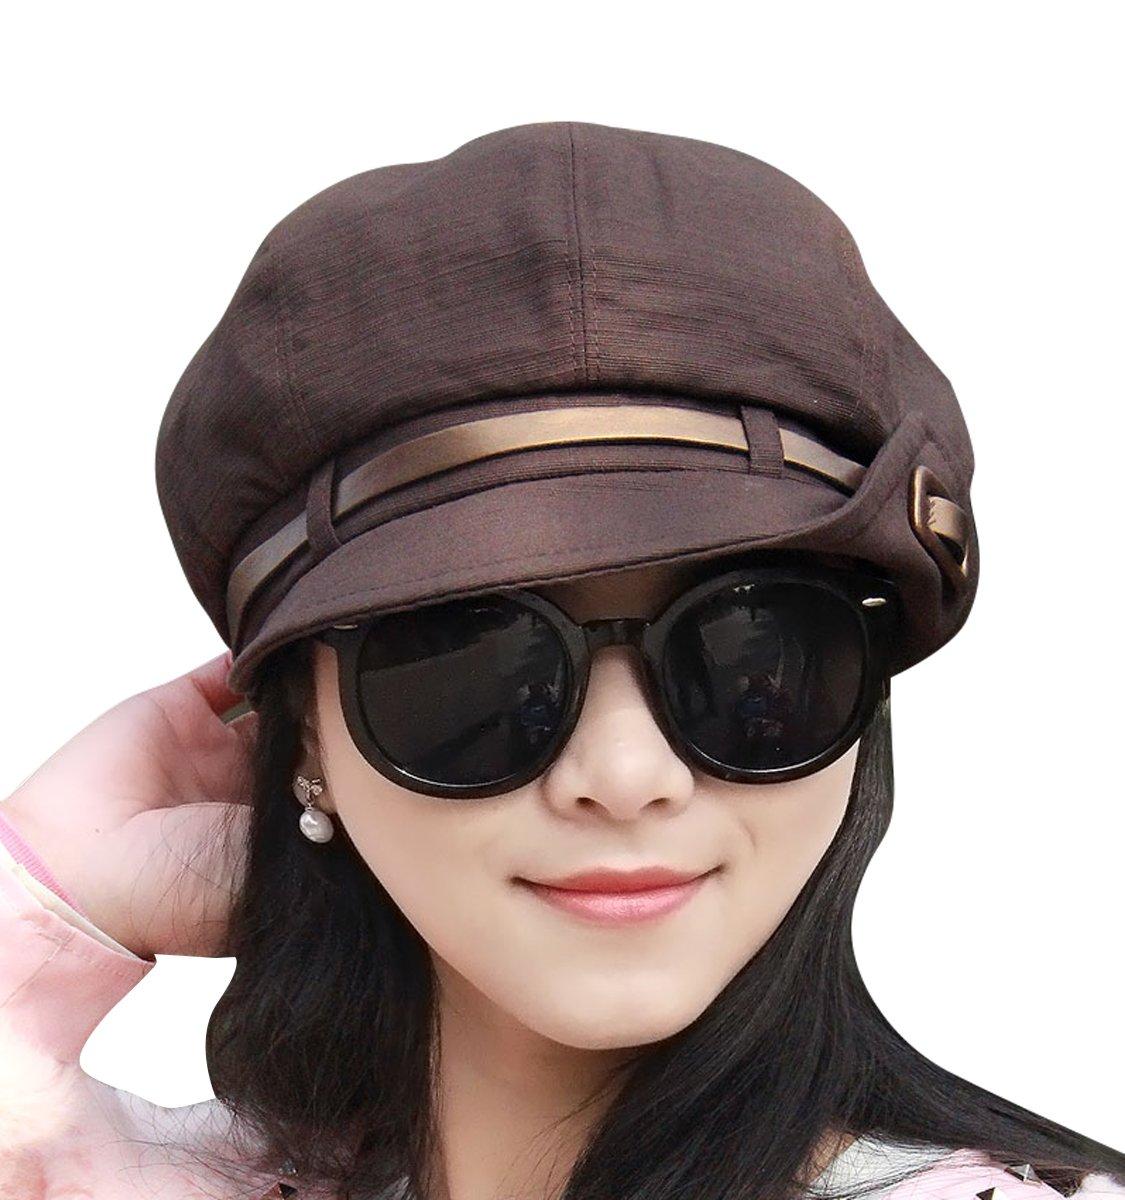 Clecibor Half Roll-up Edge Stylish newsboy Cap Adjustable Soft Cotton Octagonal Cap, Dark Coffee